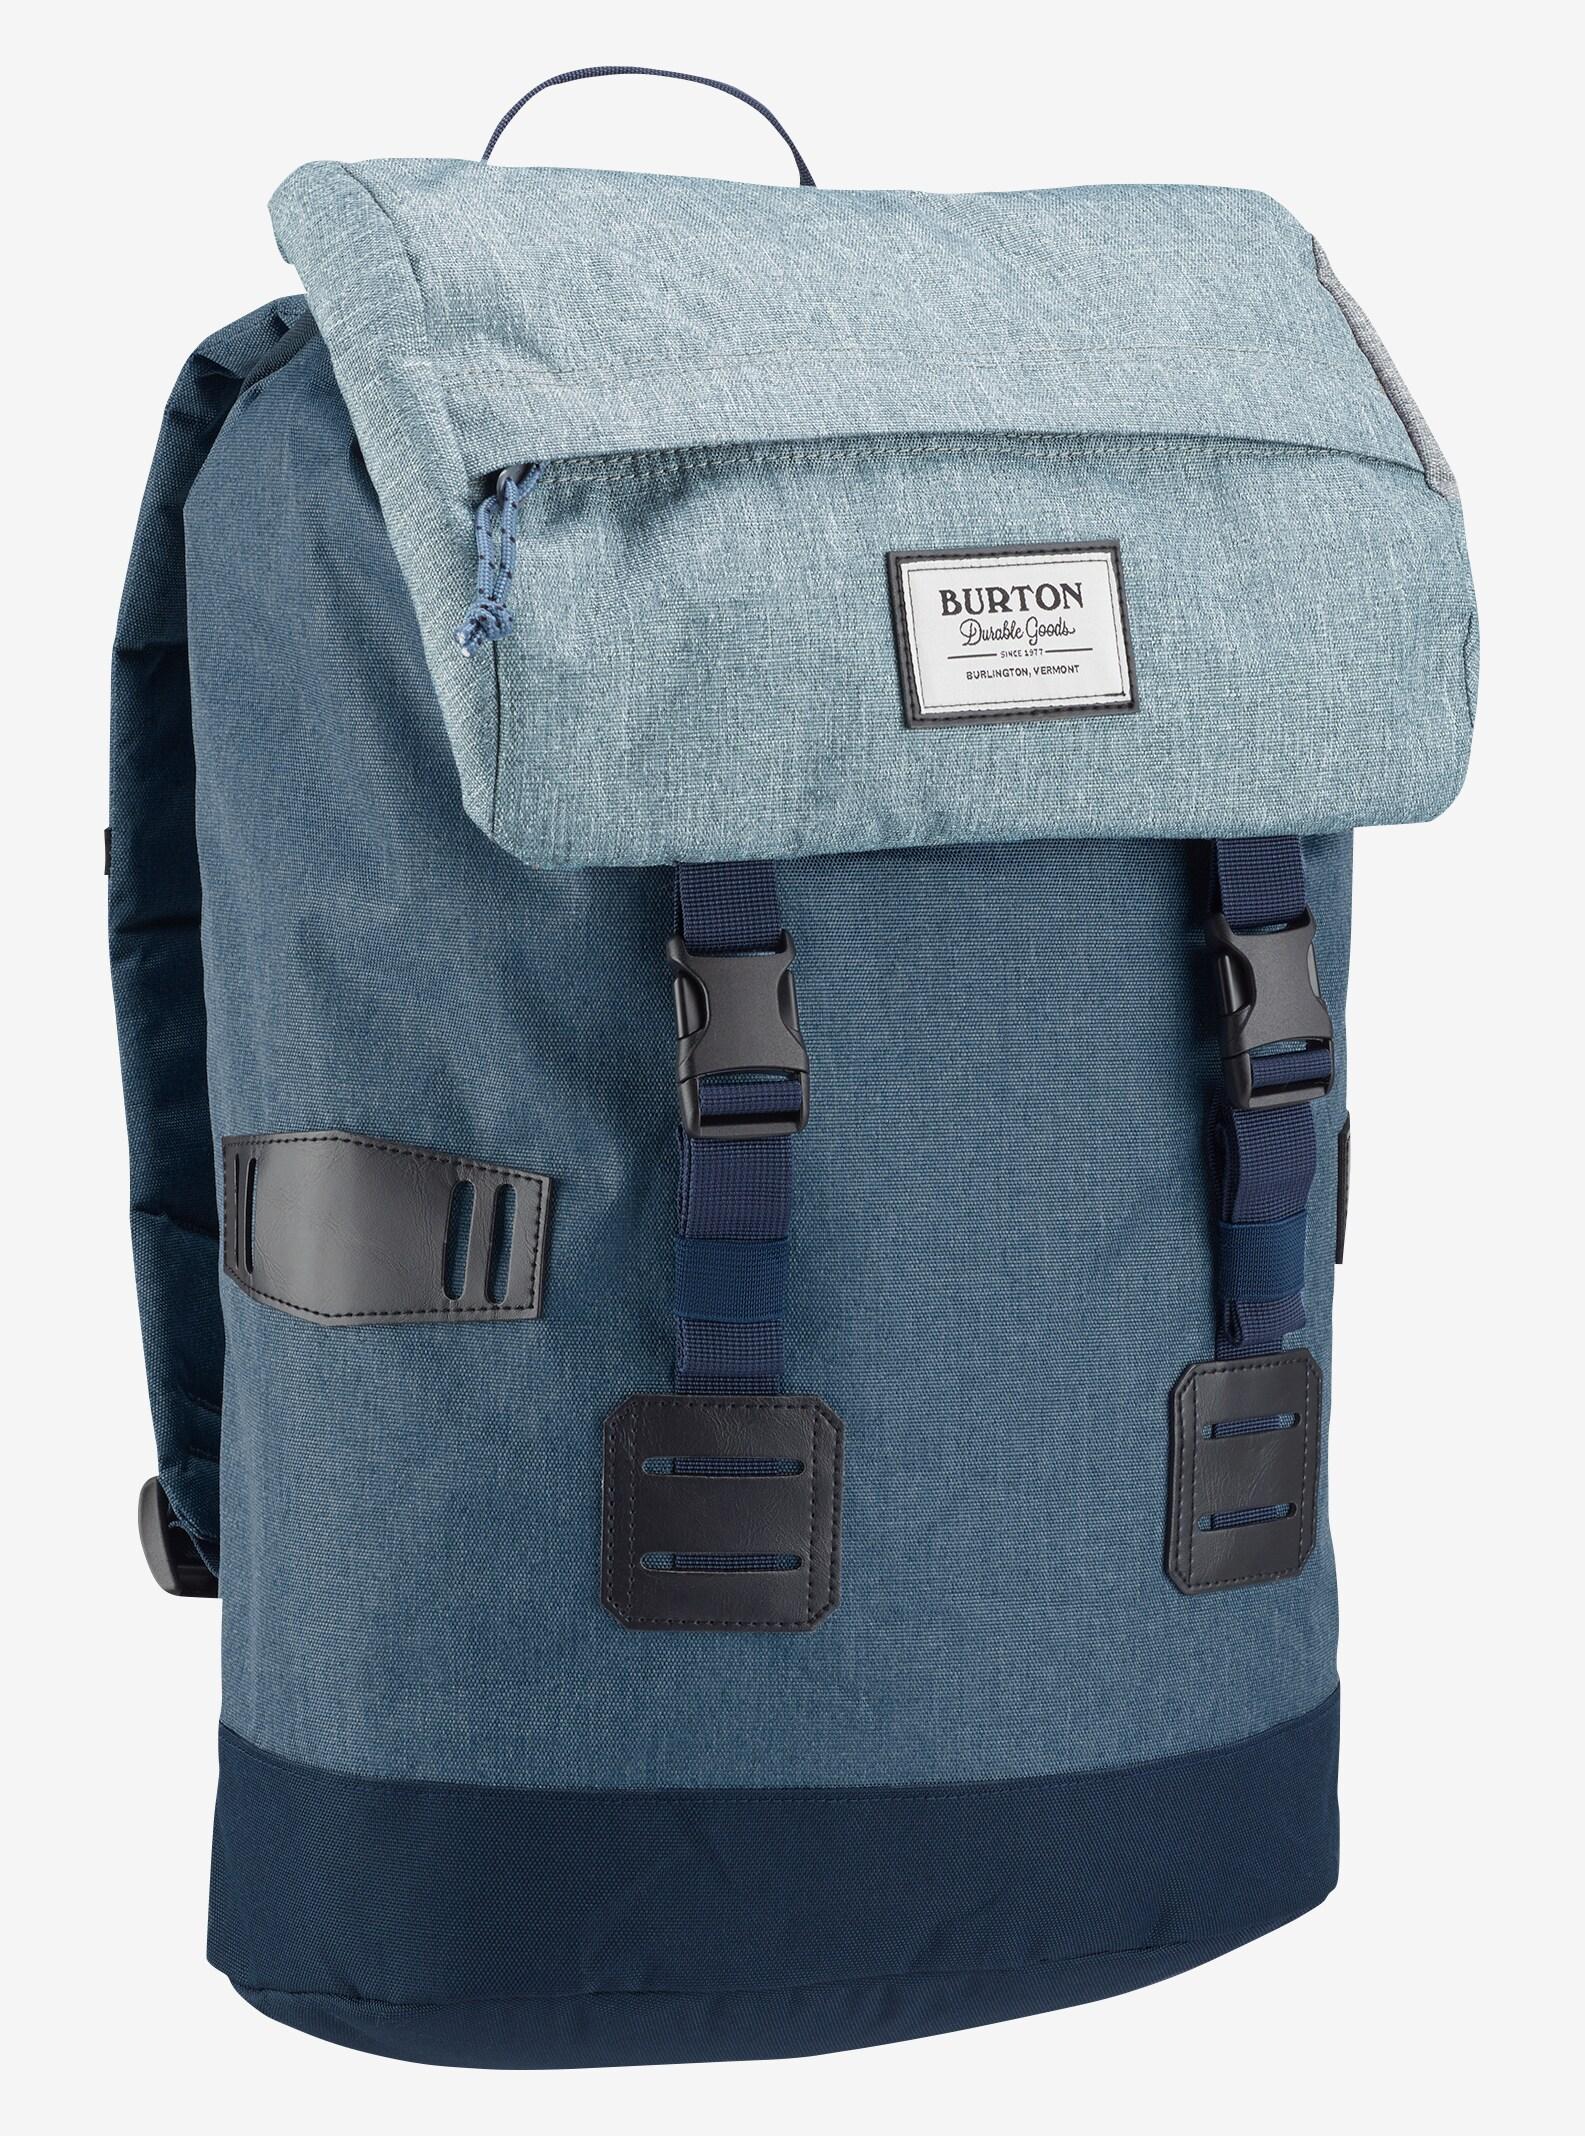 Burton Tinder Backpack shown in LA Sky Heather